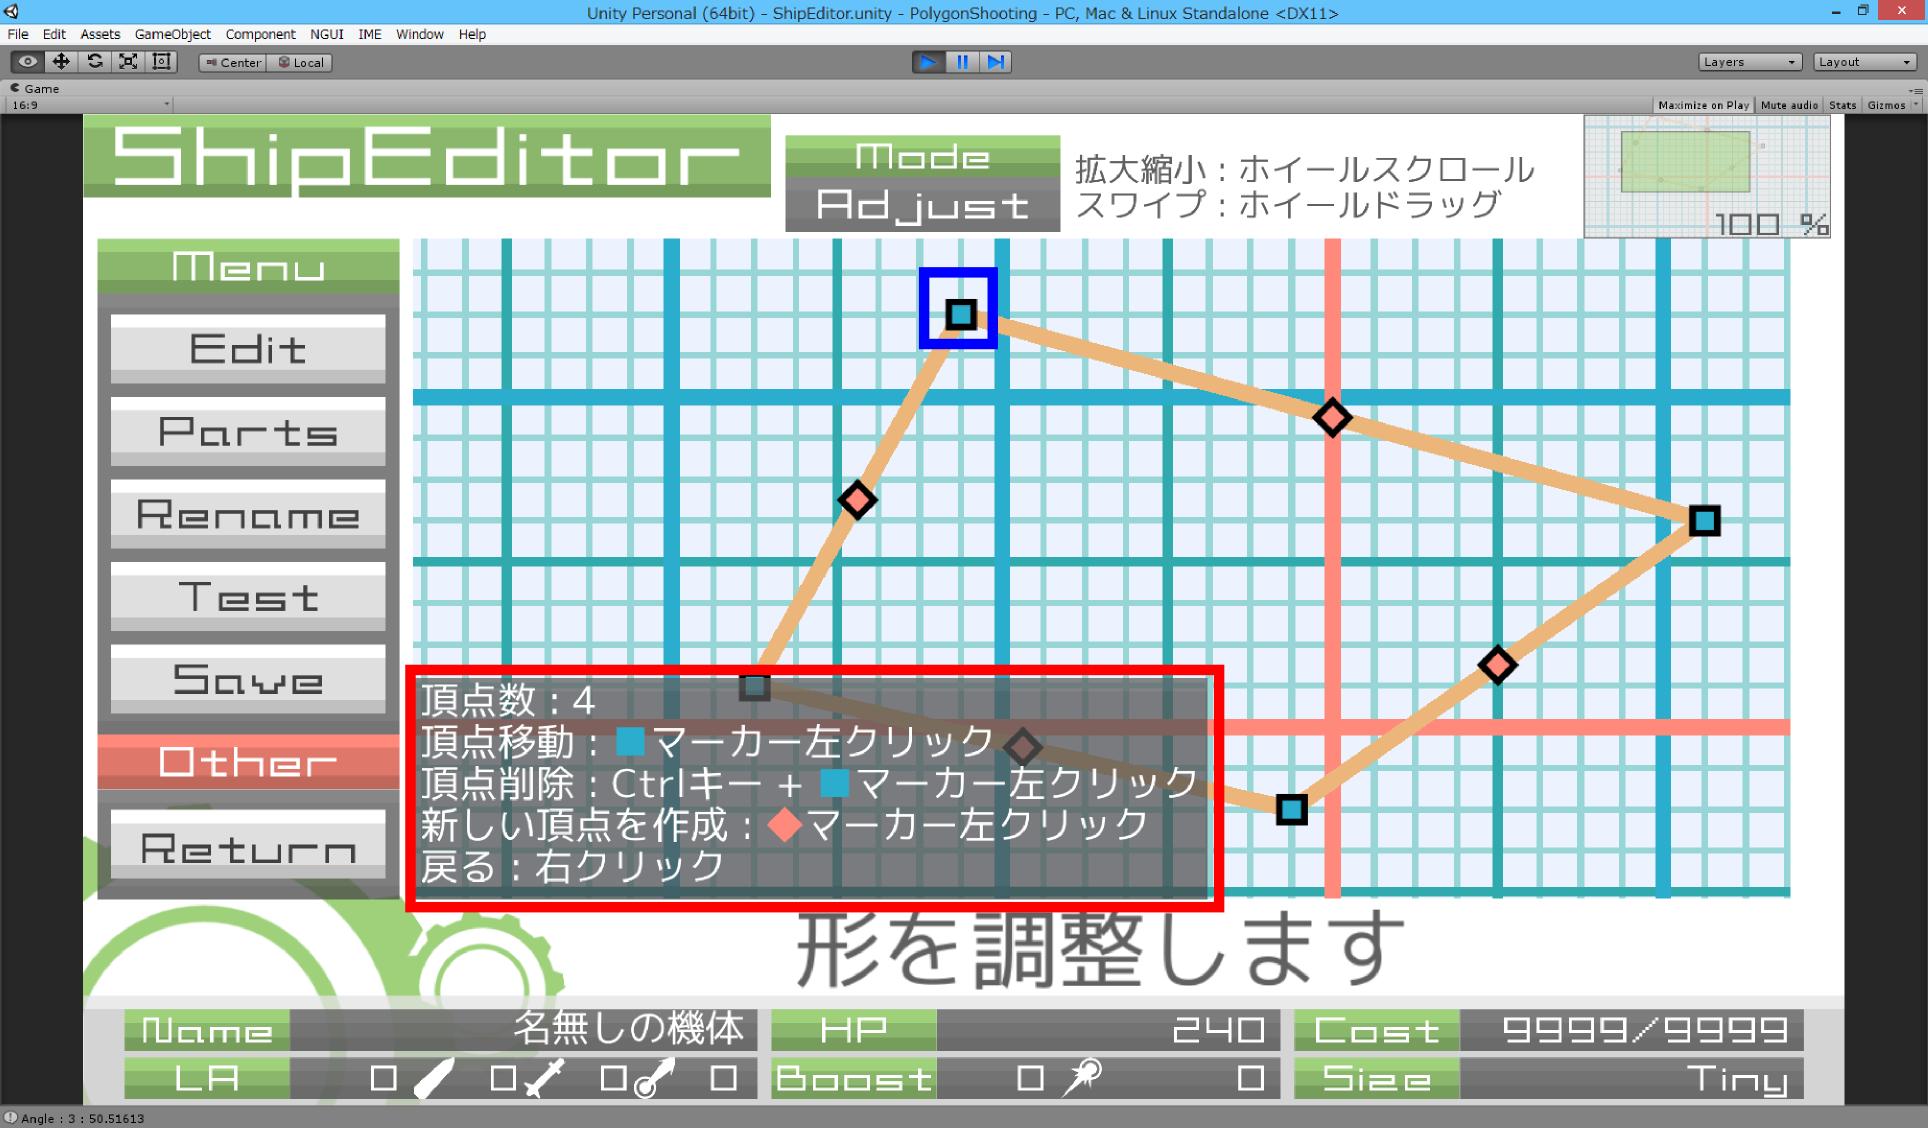 image2993.png